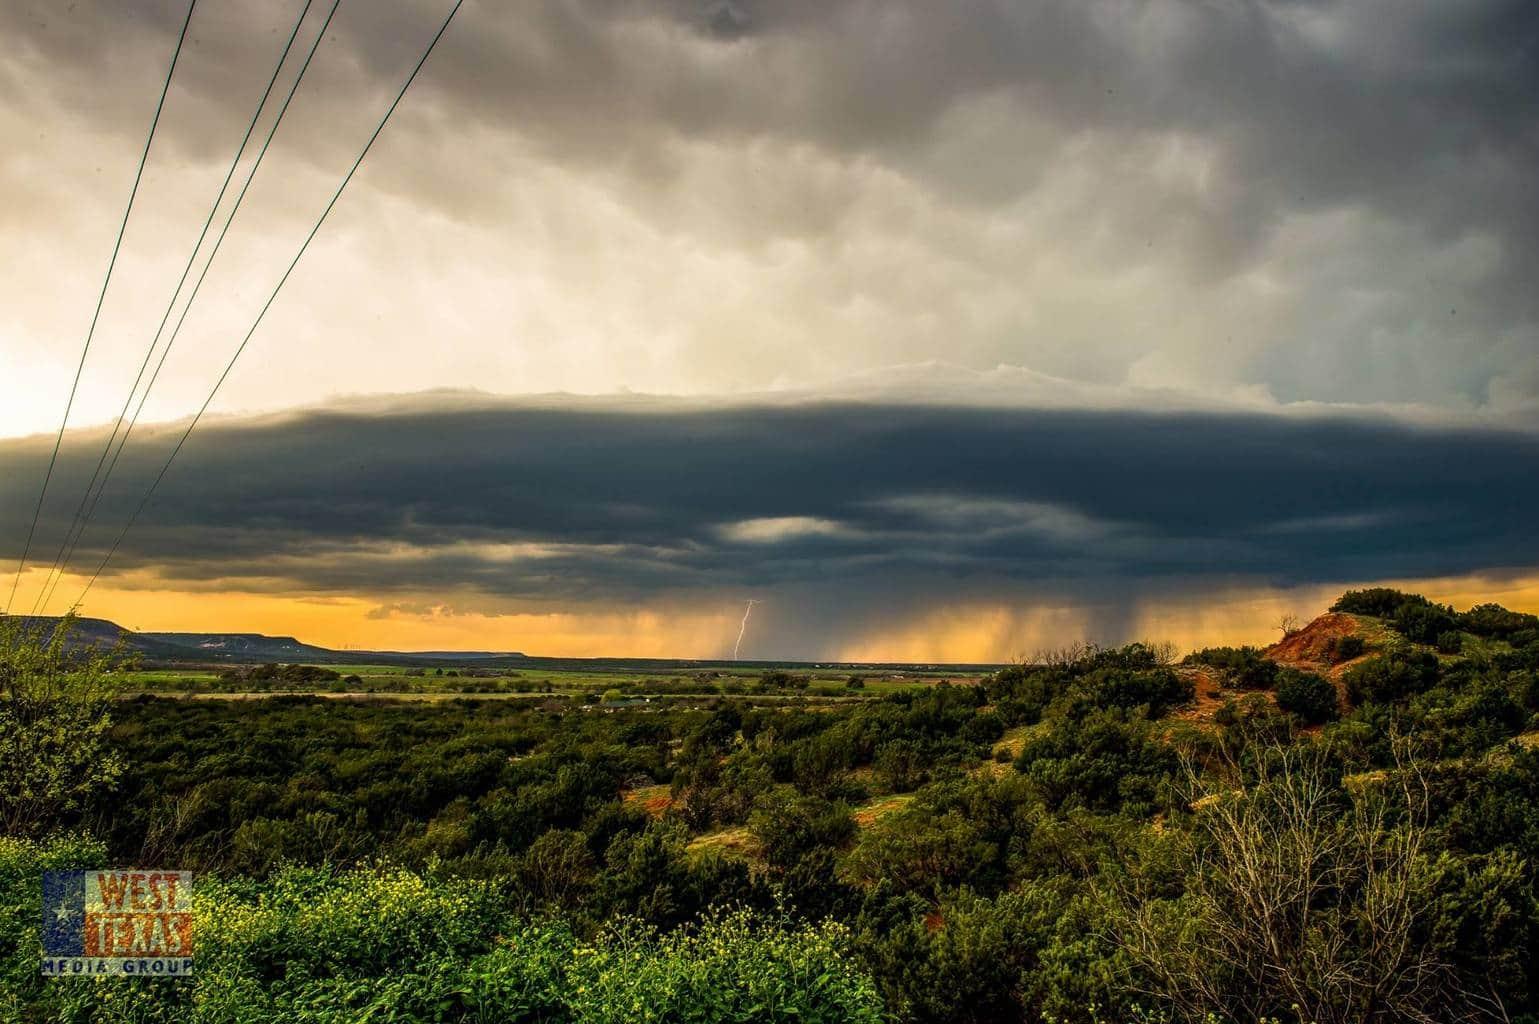 This evening near Buffalo Gap, Texas